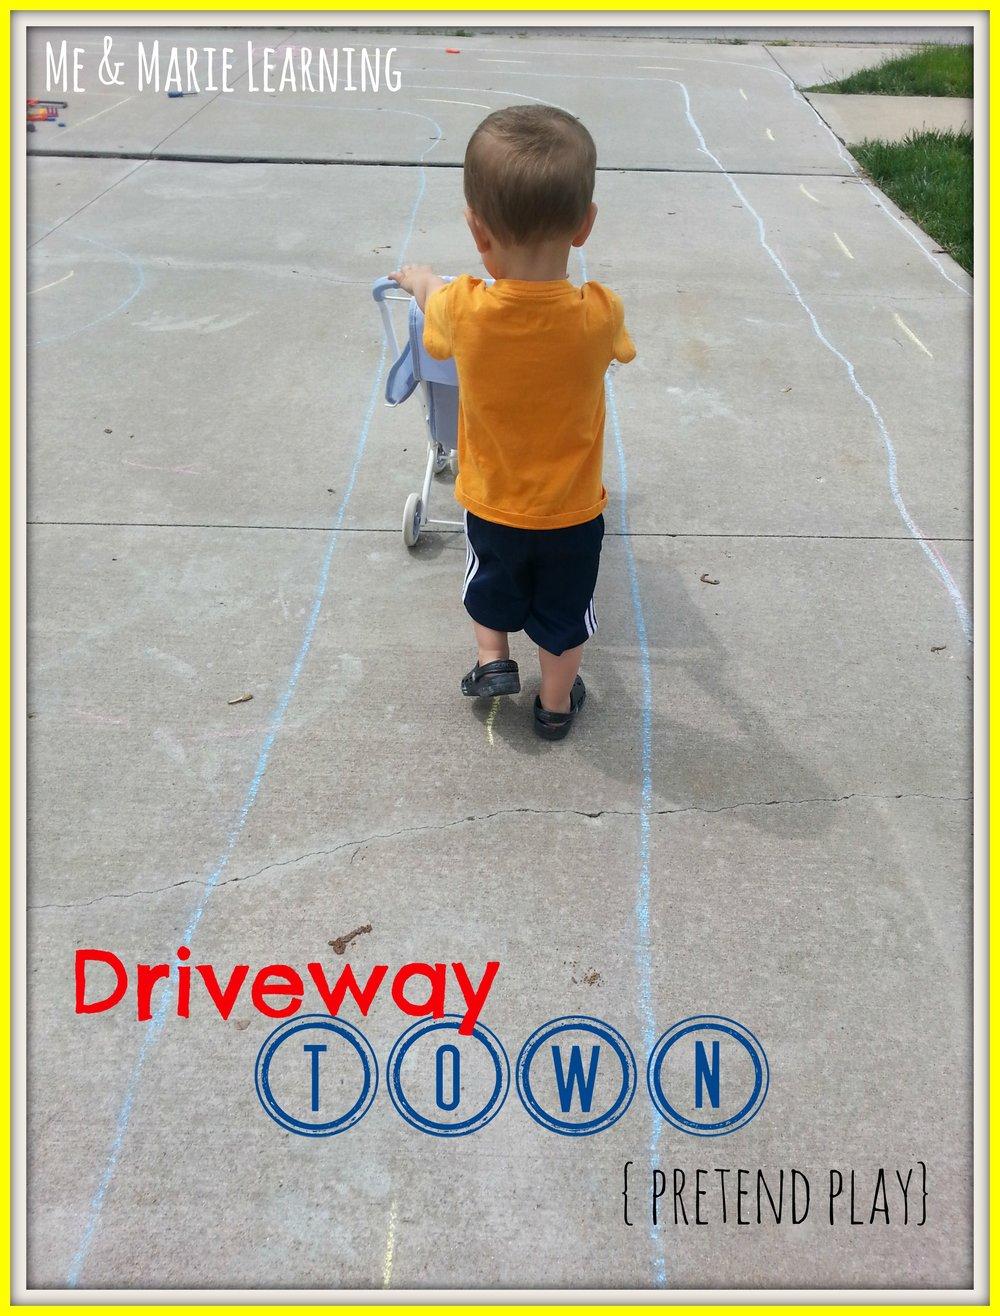 driveway-town2.jpg